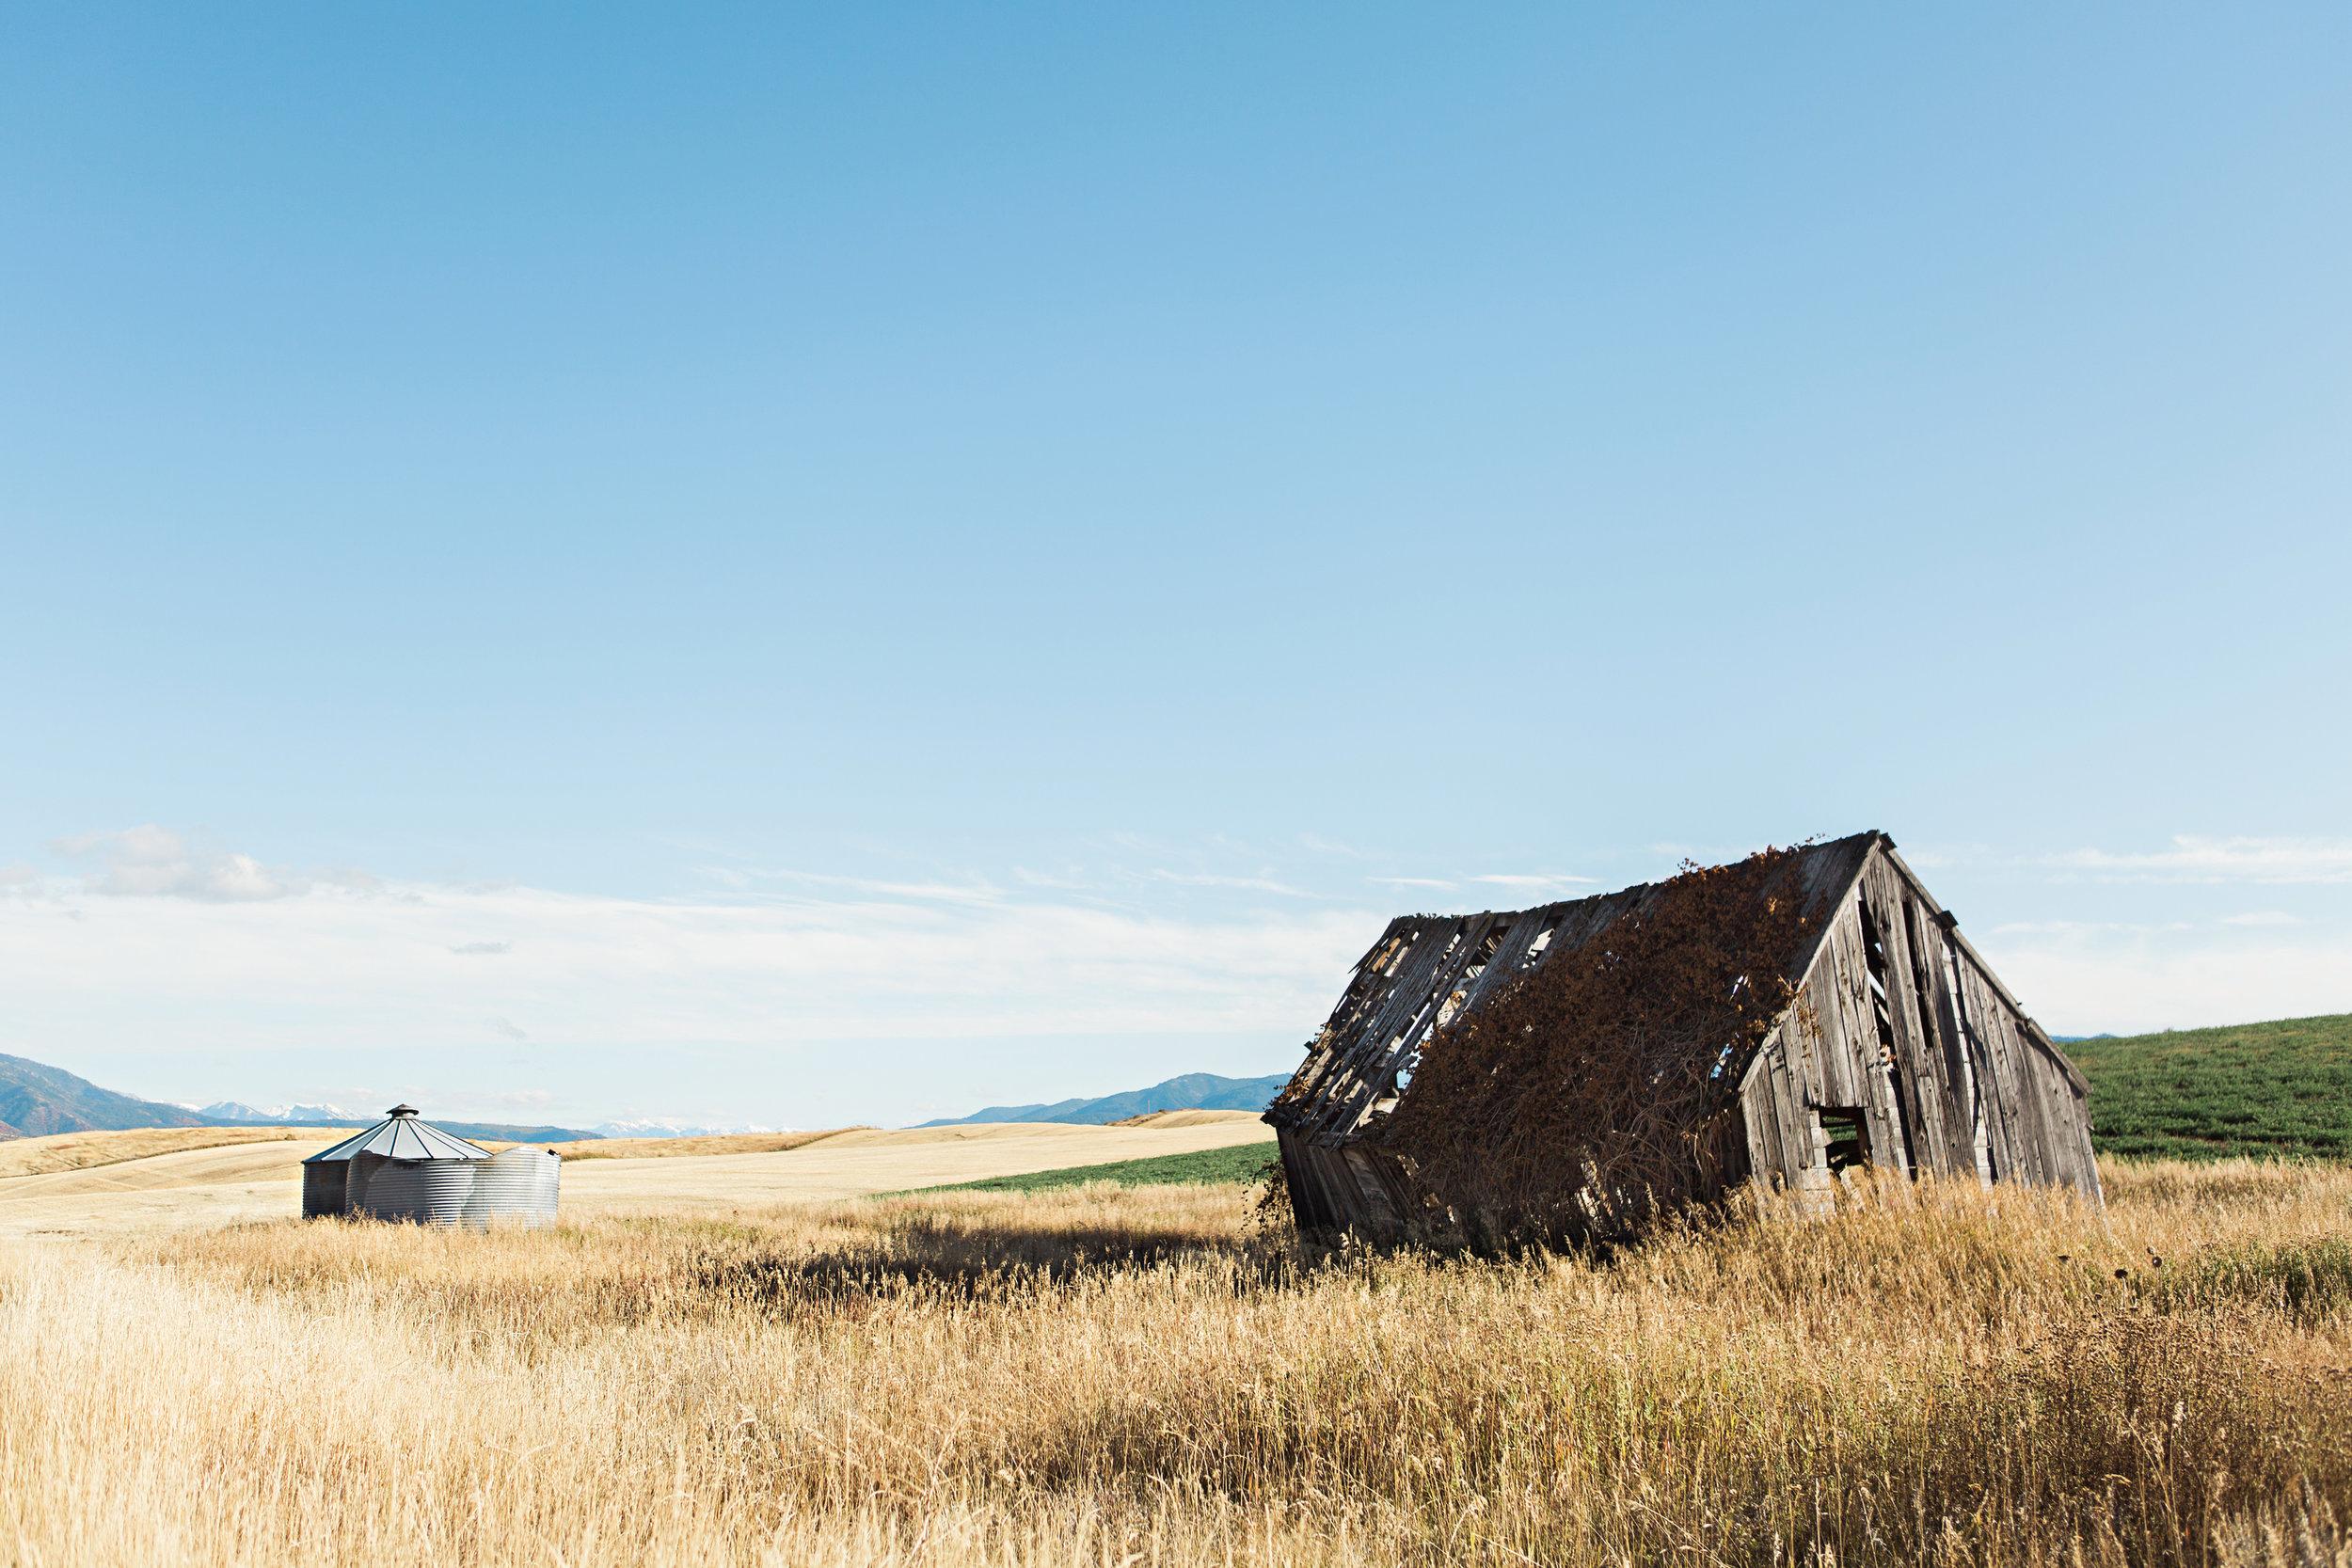 Cindy_Giovagnoli_Idaho_Wyoming_Grand_Teton_National_Park_autumn_aspens_camping_mountains-001.jpg